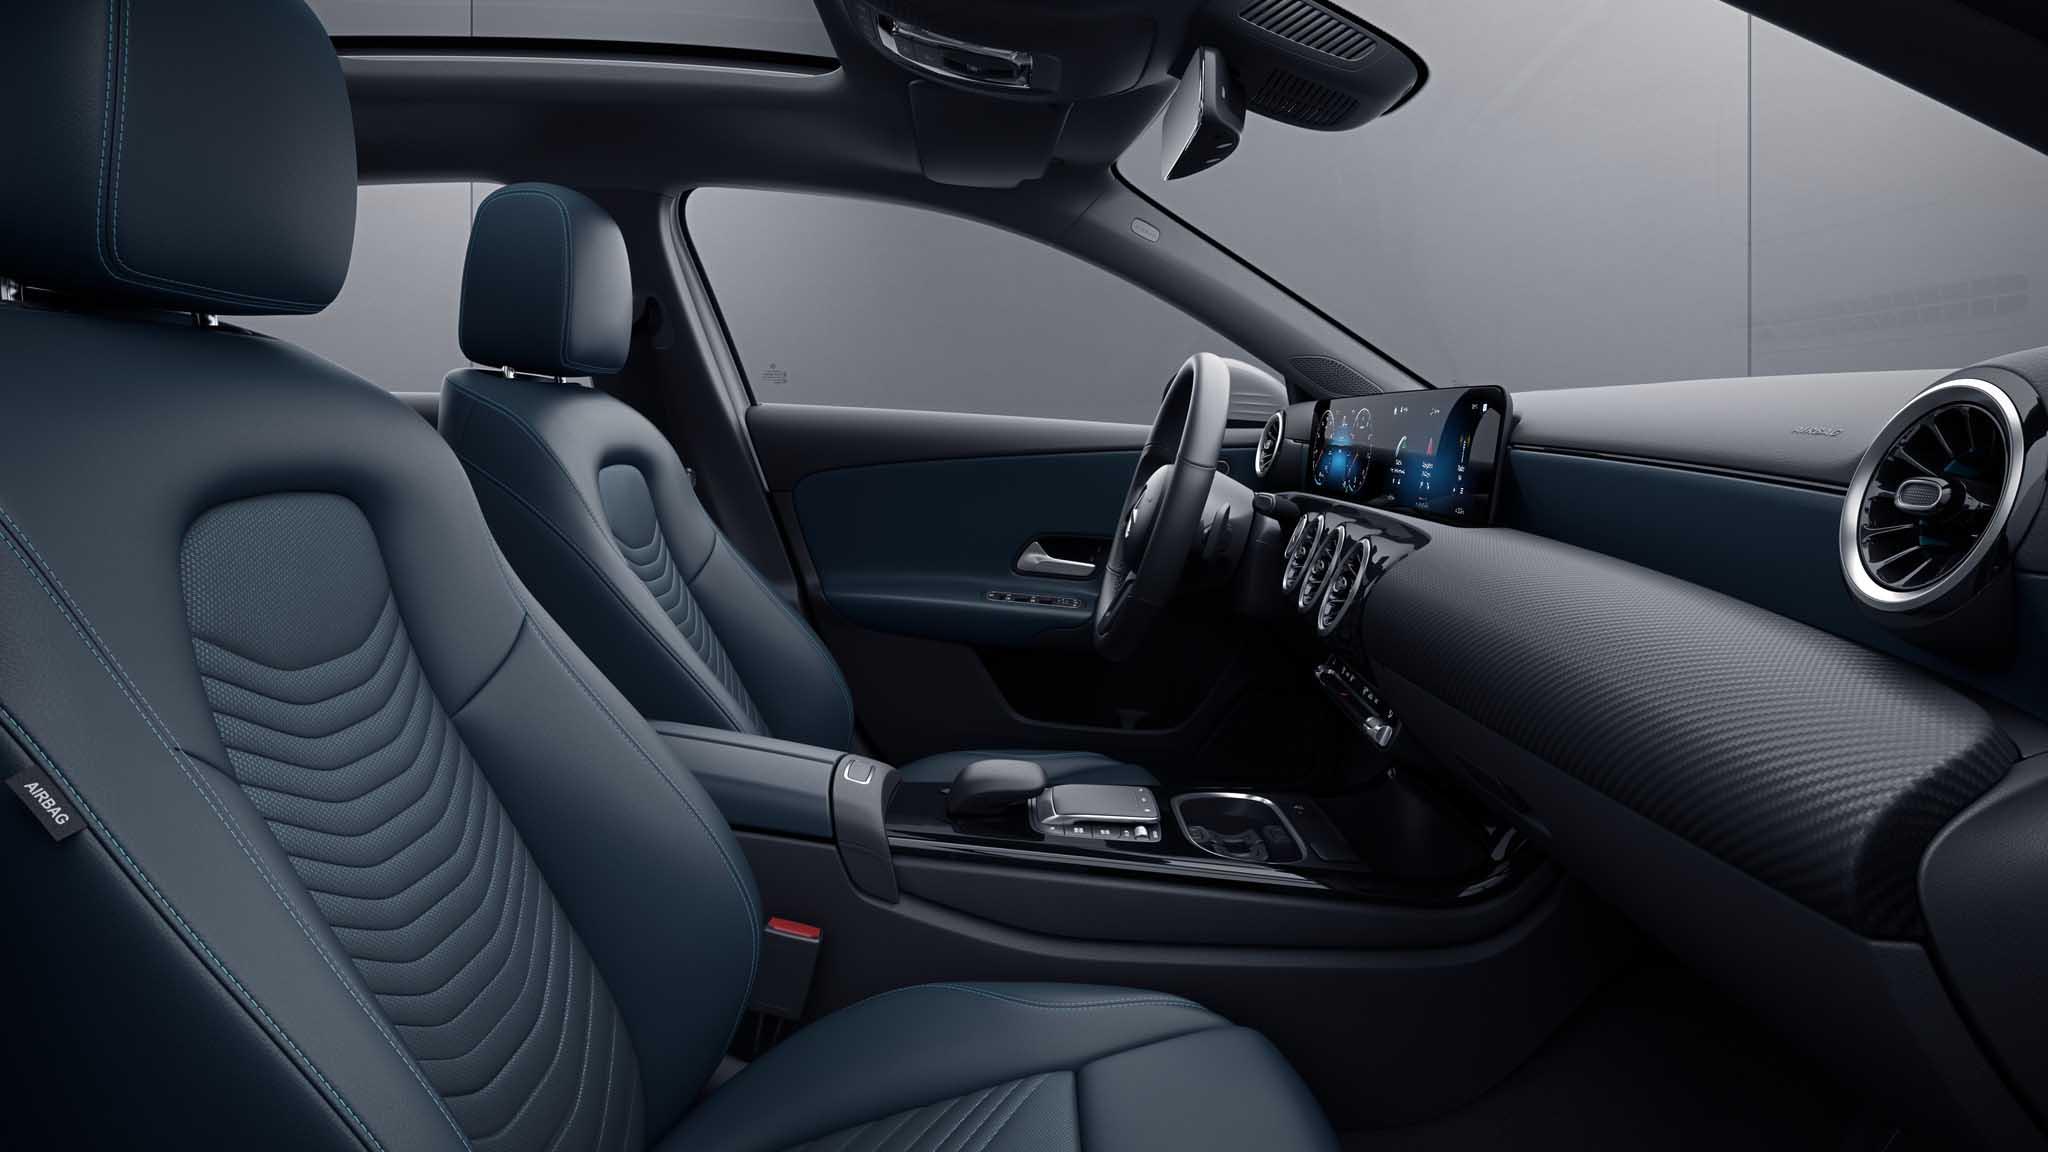 Habitacle de la Mercedes Classe A avec une Sellerie Similicuir Tissu bleu indigo/noir